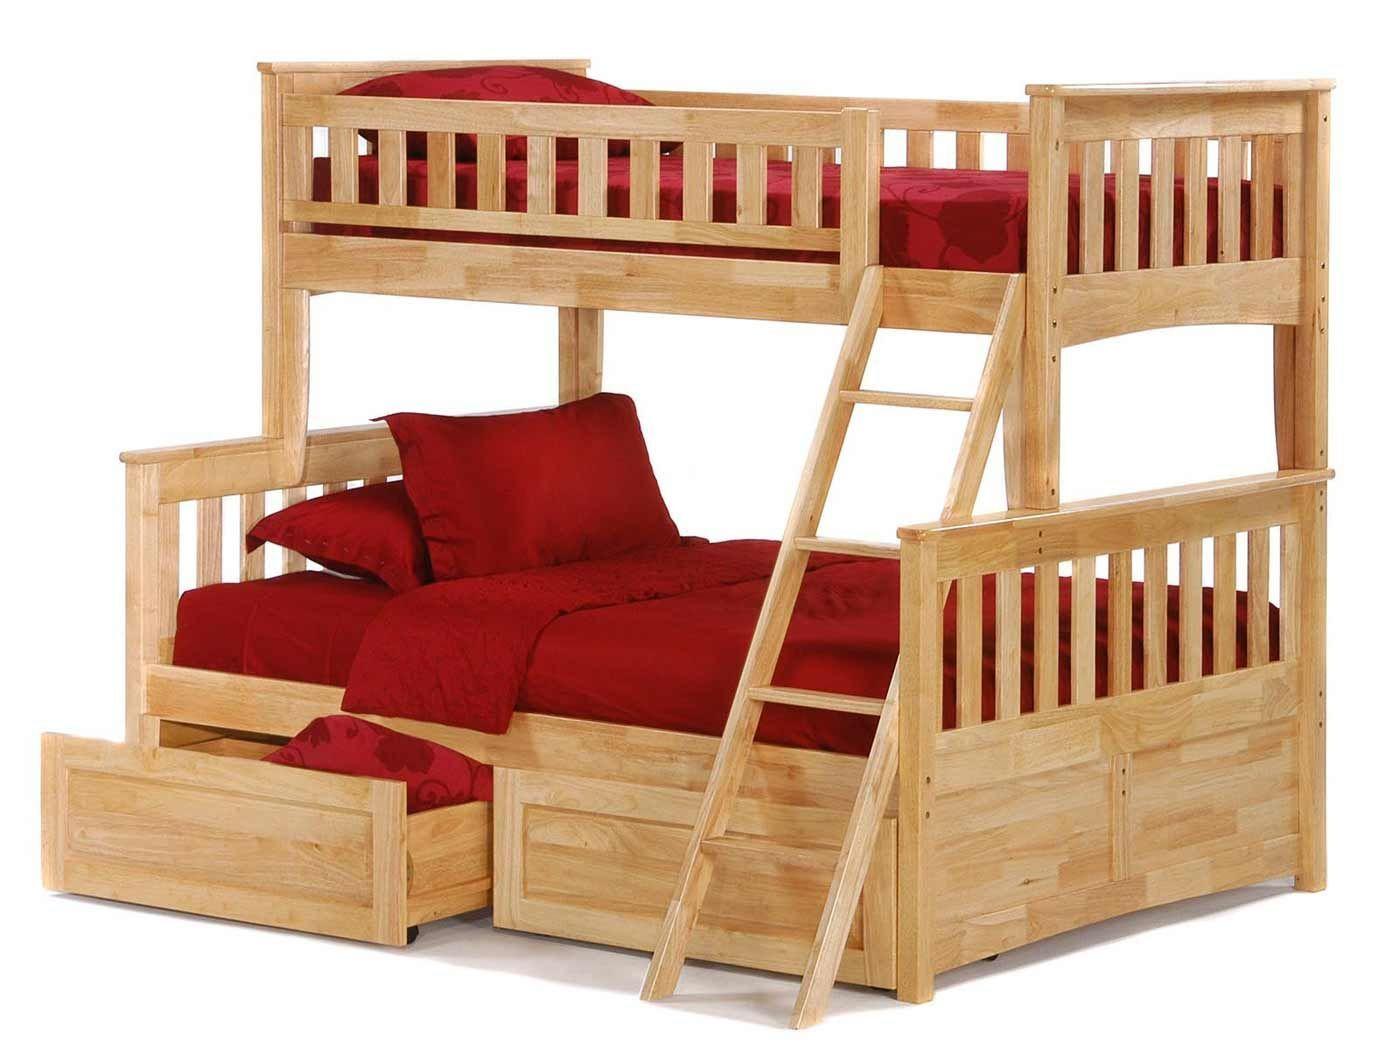 77 Twin Over Full Bunk Bed Ikea Master Bedroom Interior Design